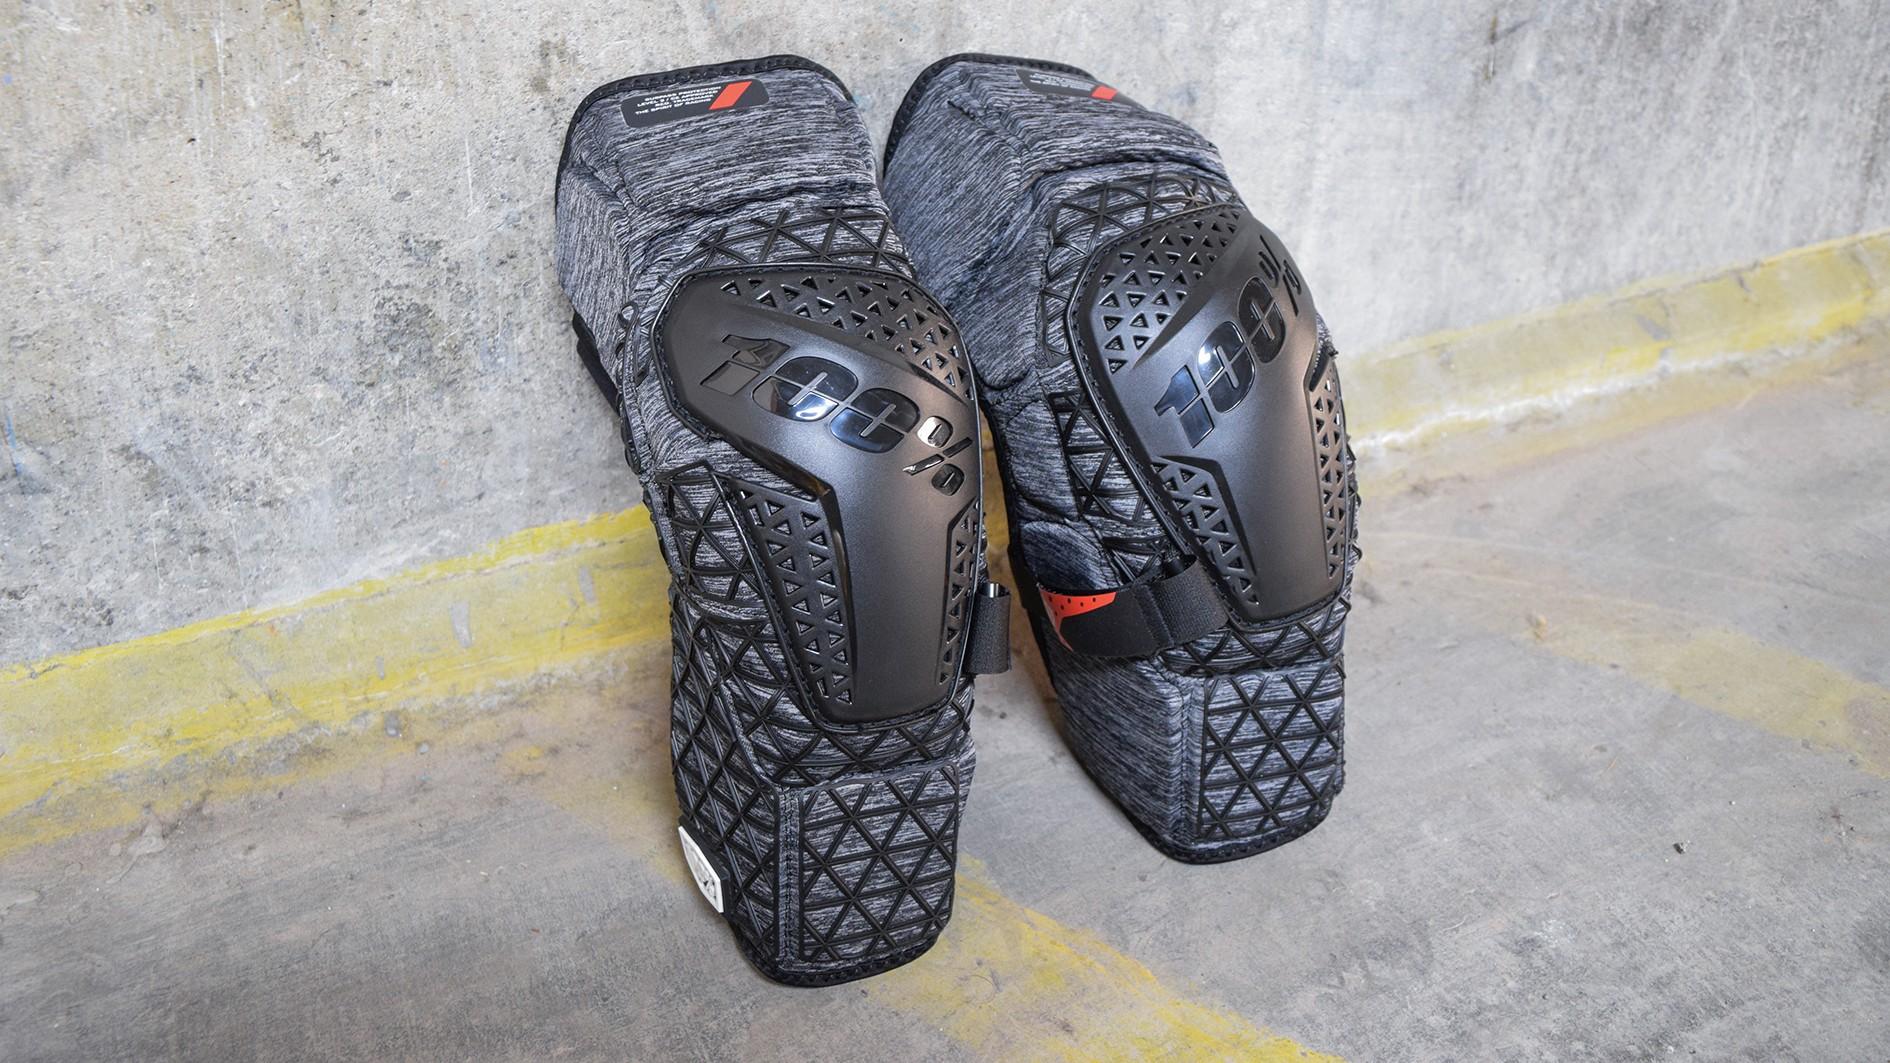 100% Surpass knee pad